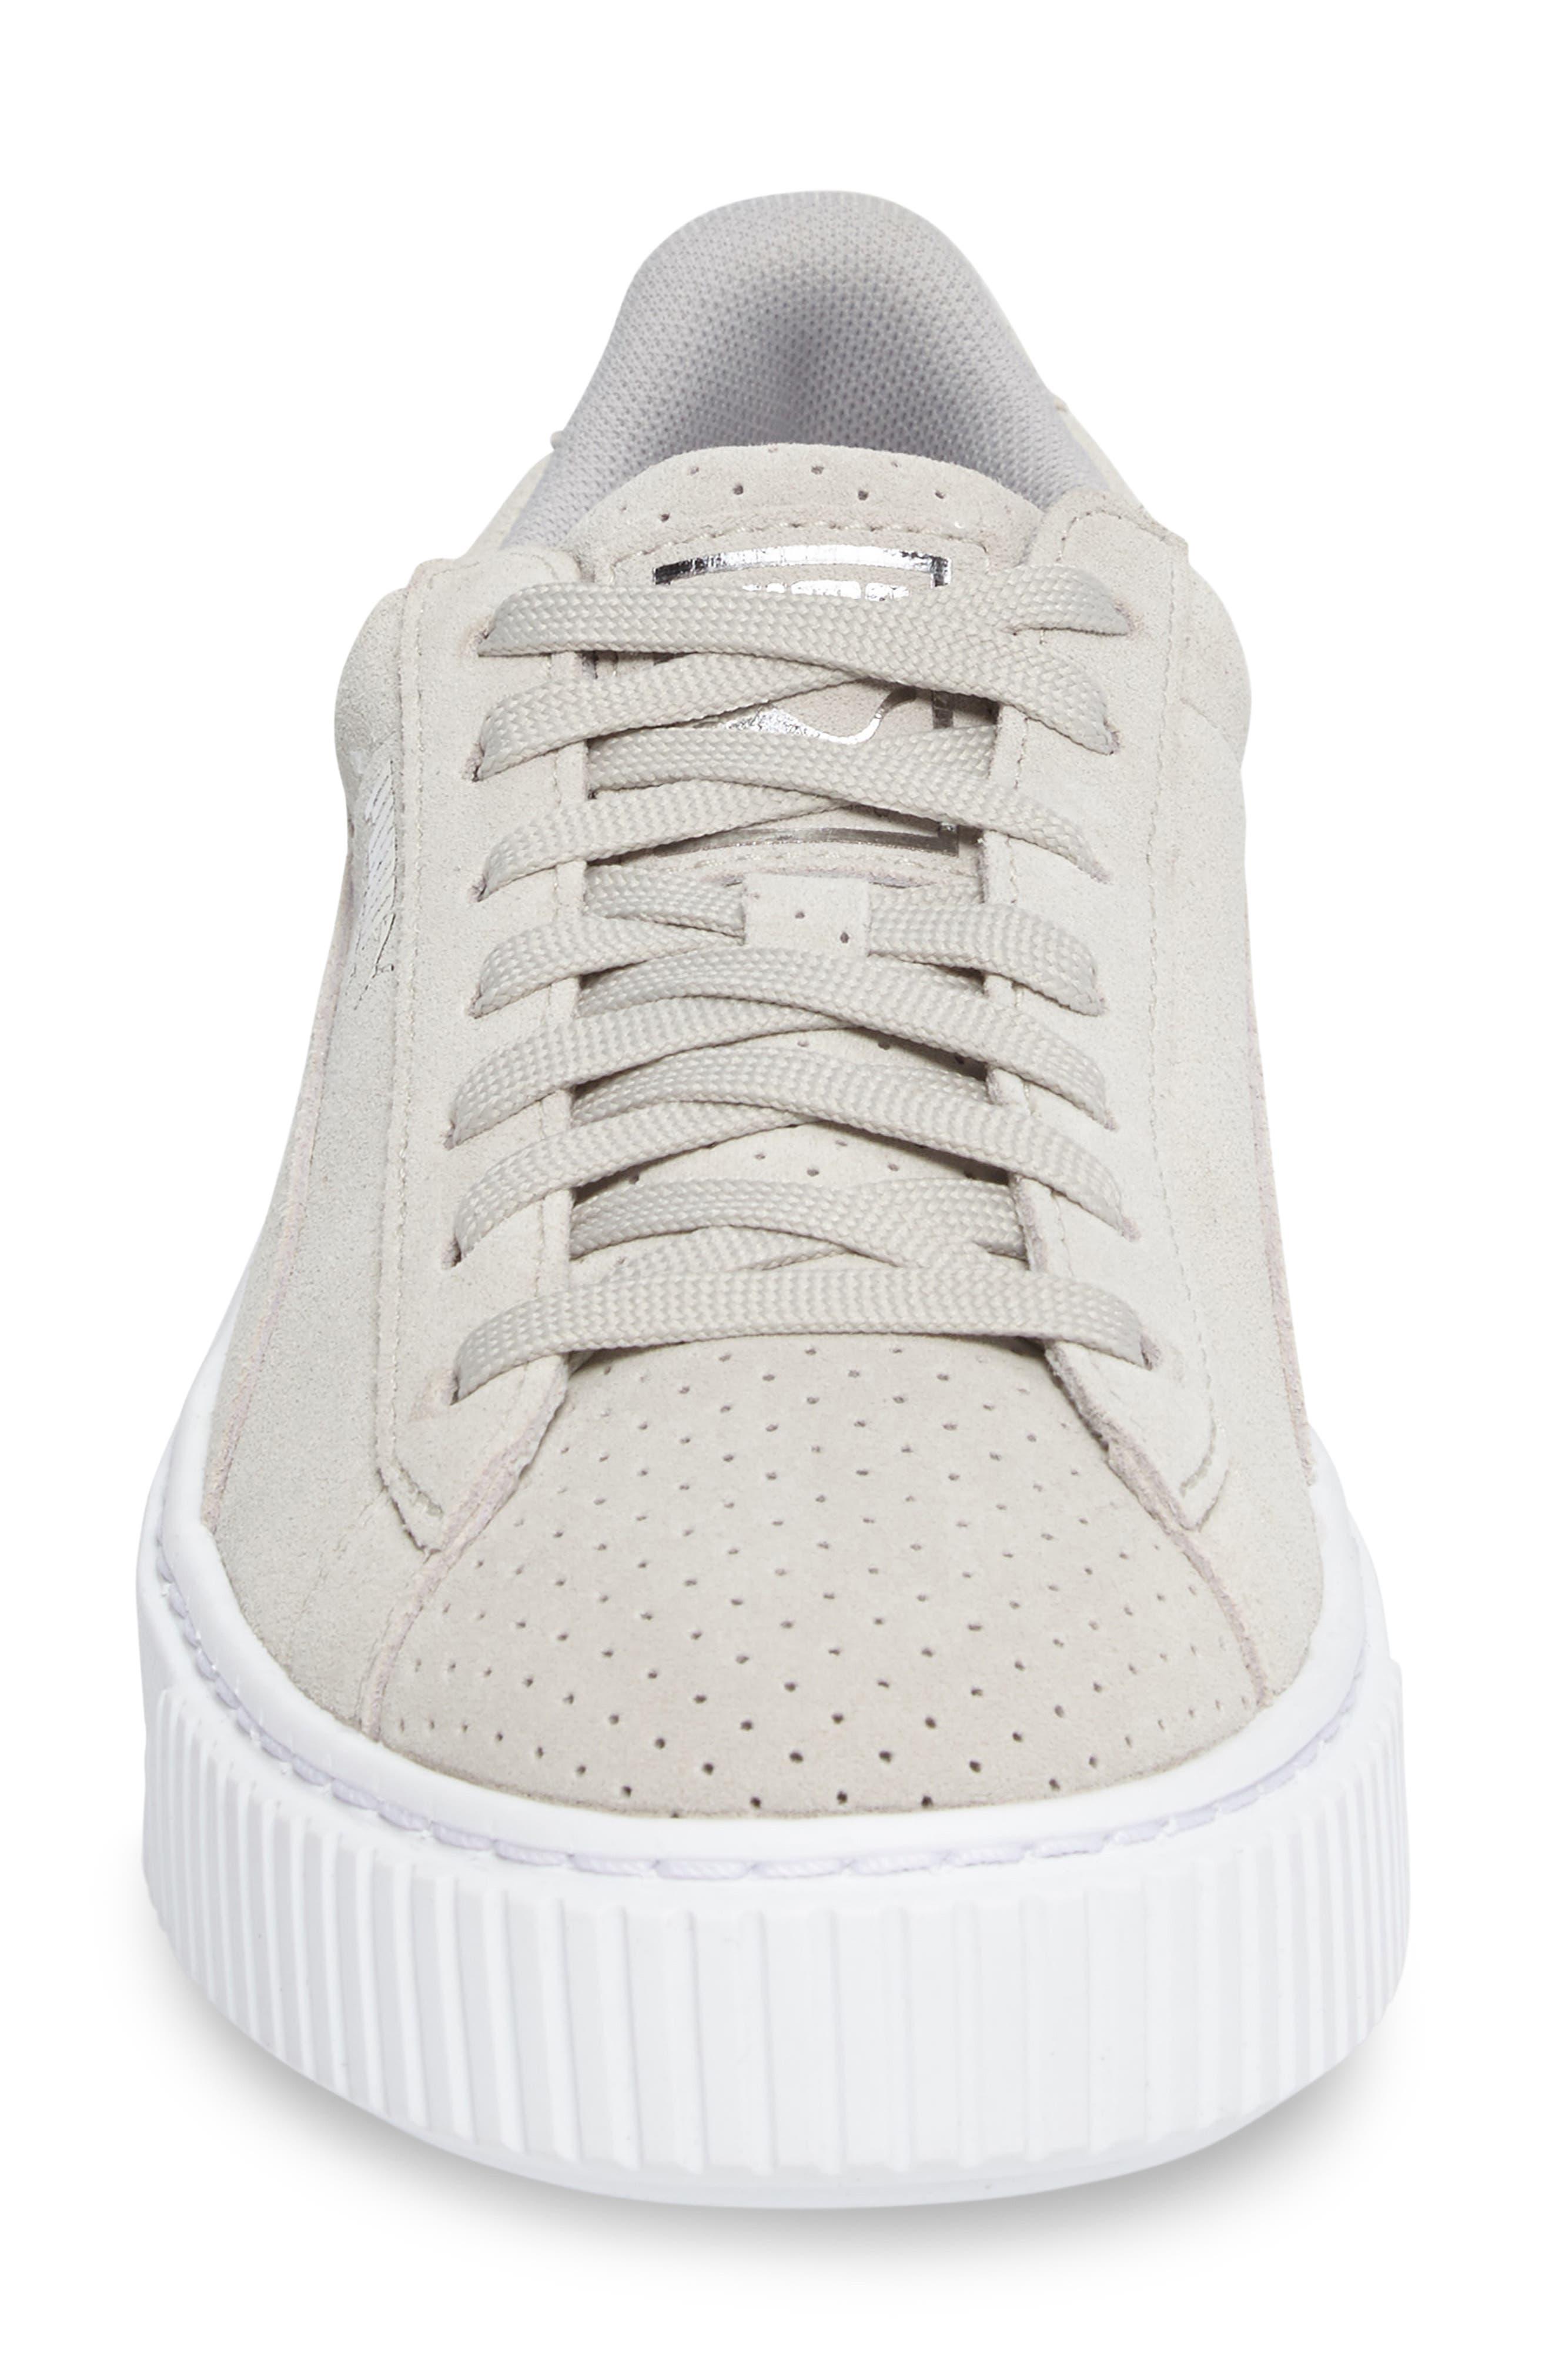 PUMA,                             Basket Platform Sneaker,                             Alternate thumbnail 4, color,                             060